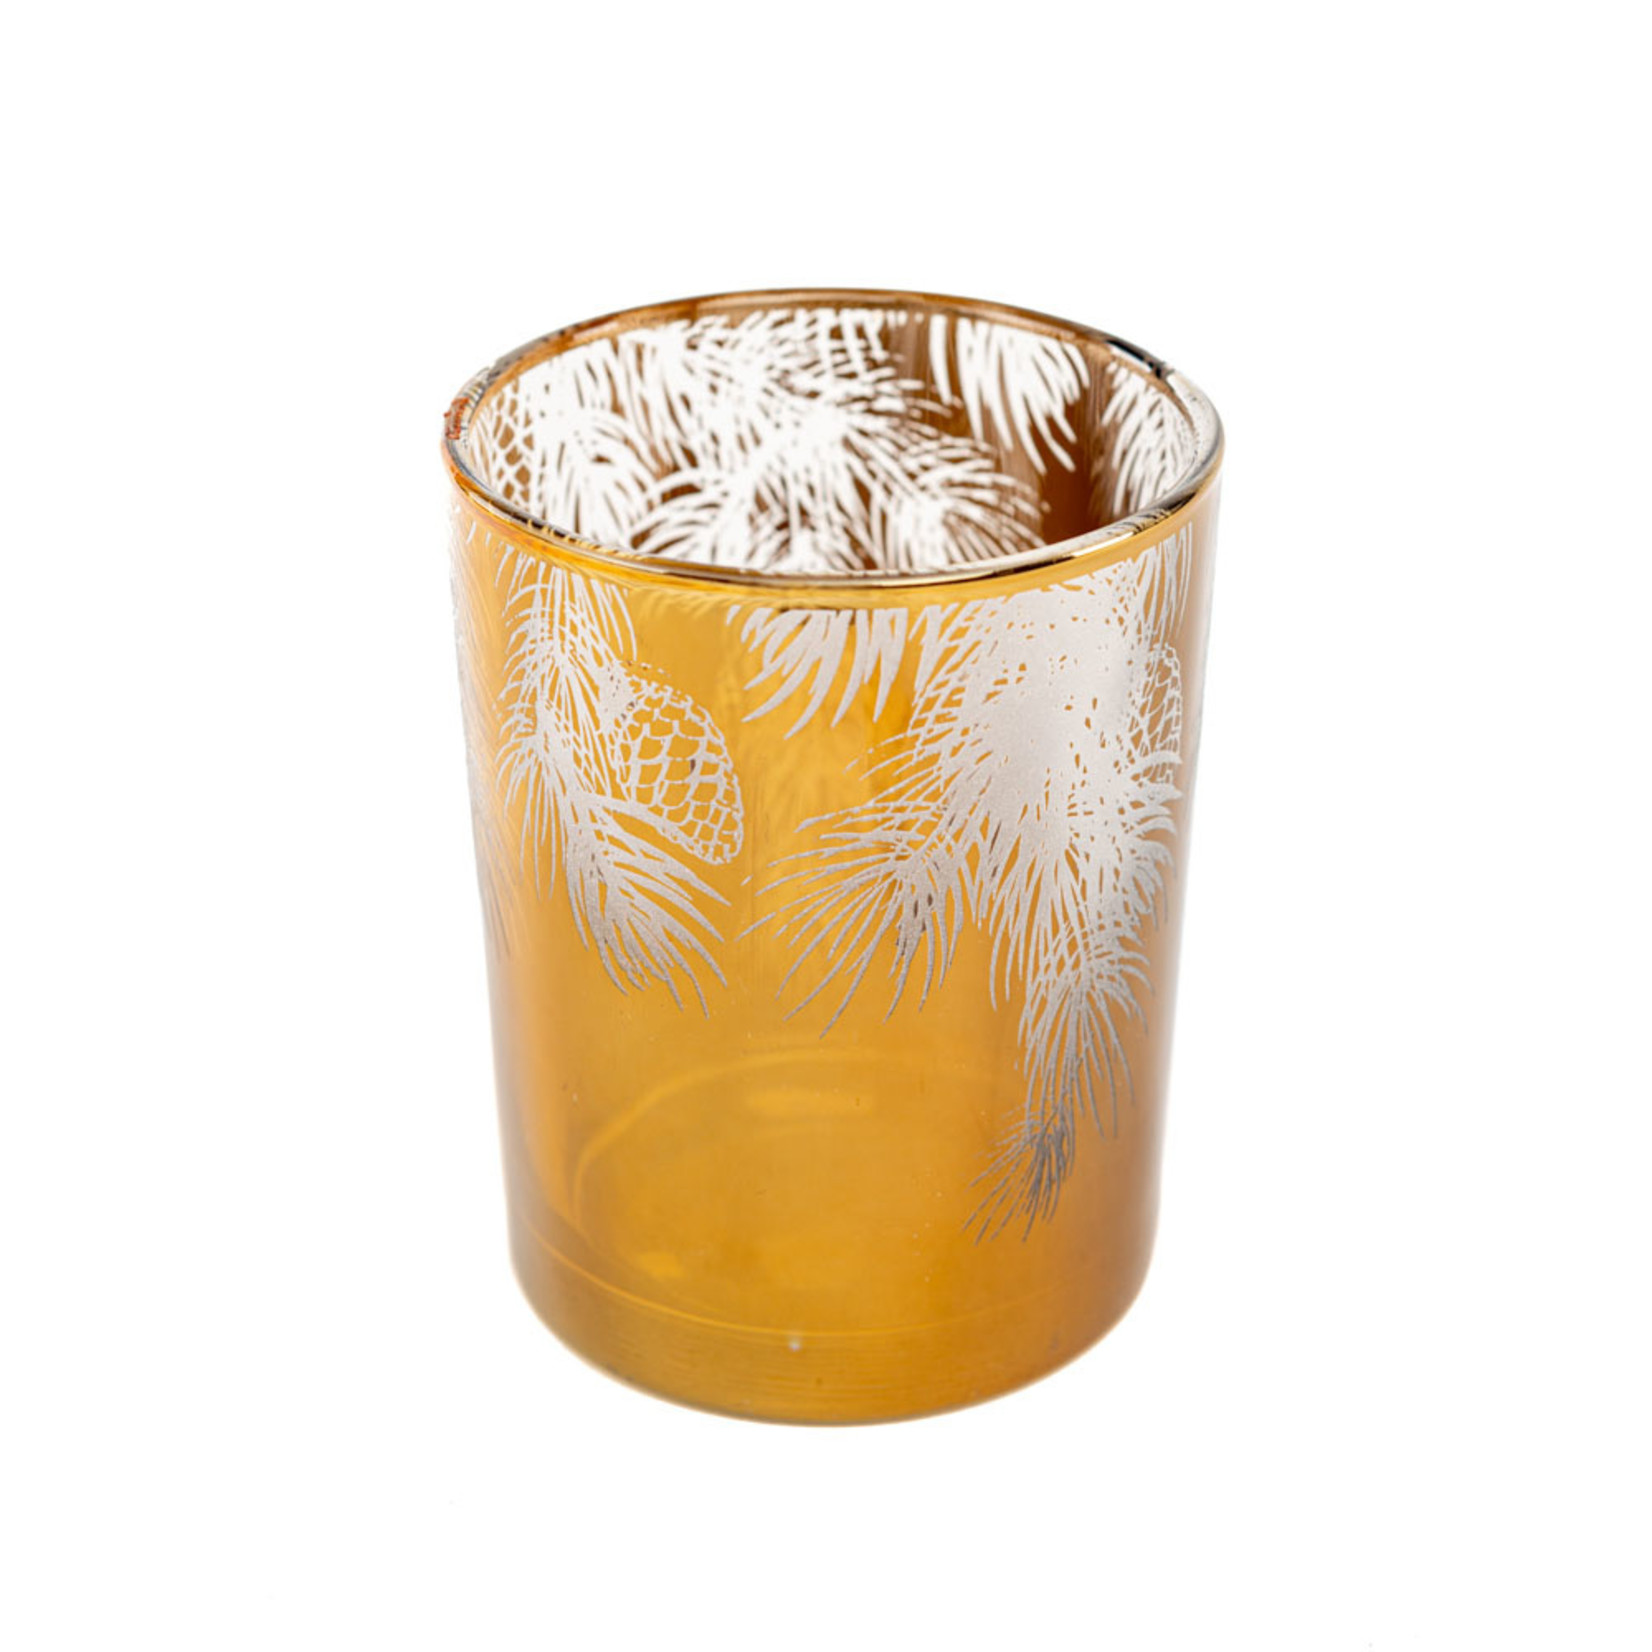 Home Society Hurricane / Windlicht Oldham bruin/goud